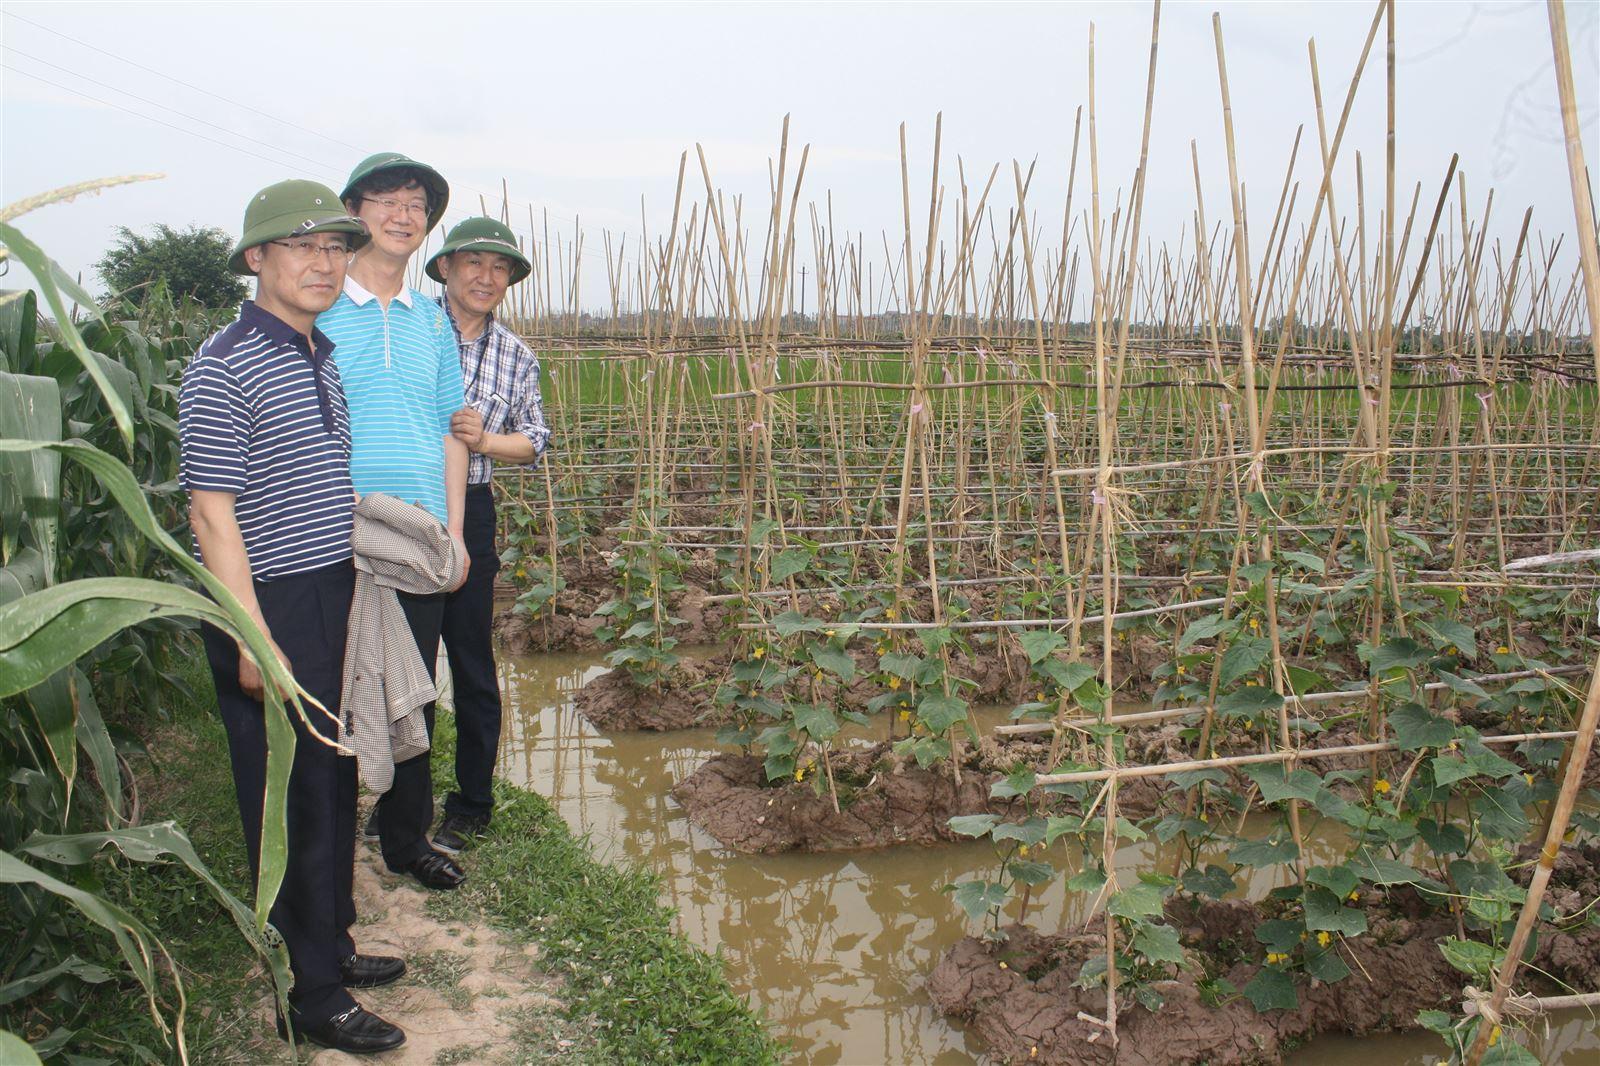 Cucumber farm